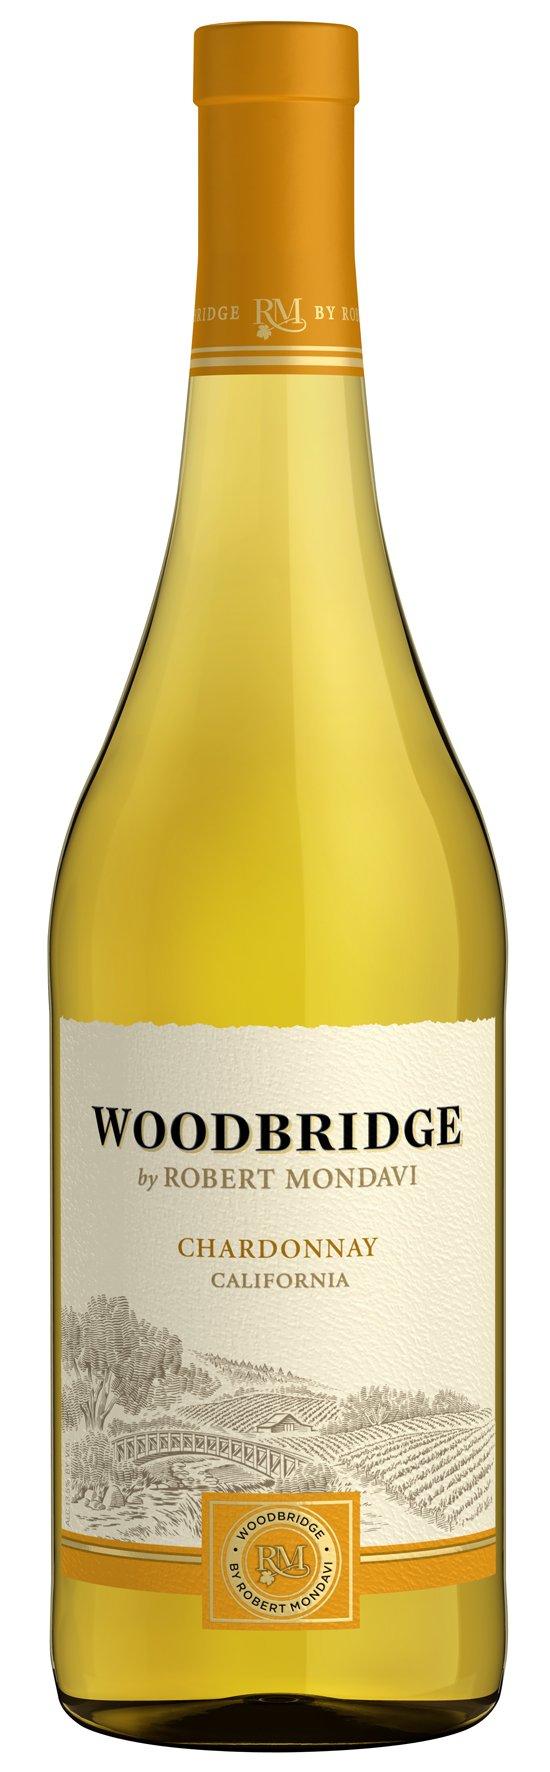 Robert-Mondavi-Woodbridge-Woodbridge-Chardonnay-2016-Weiss-12-x-075l